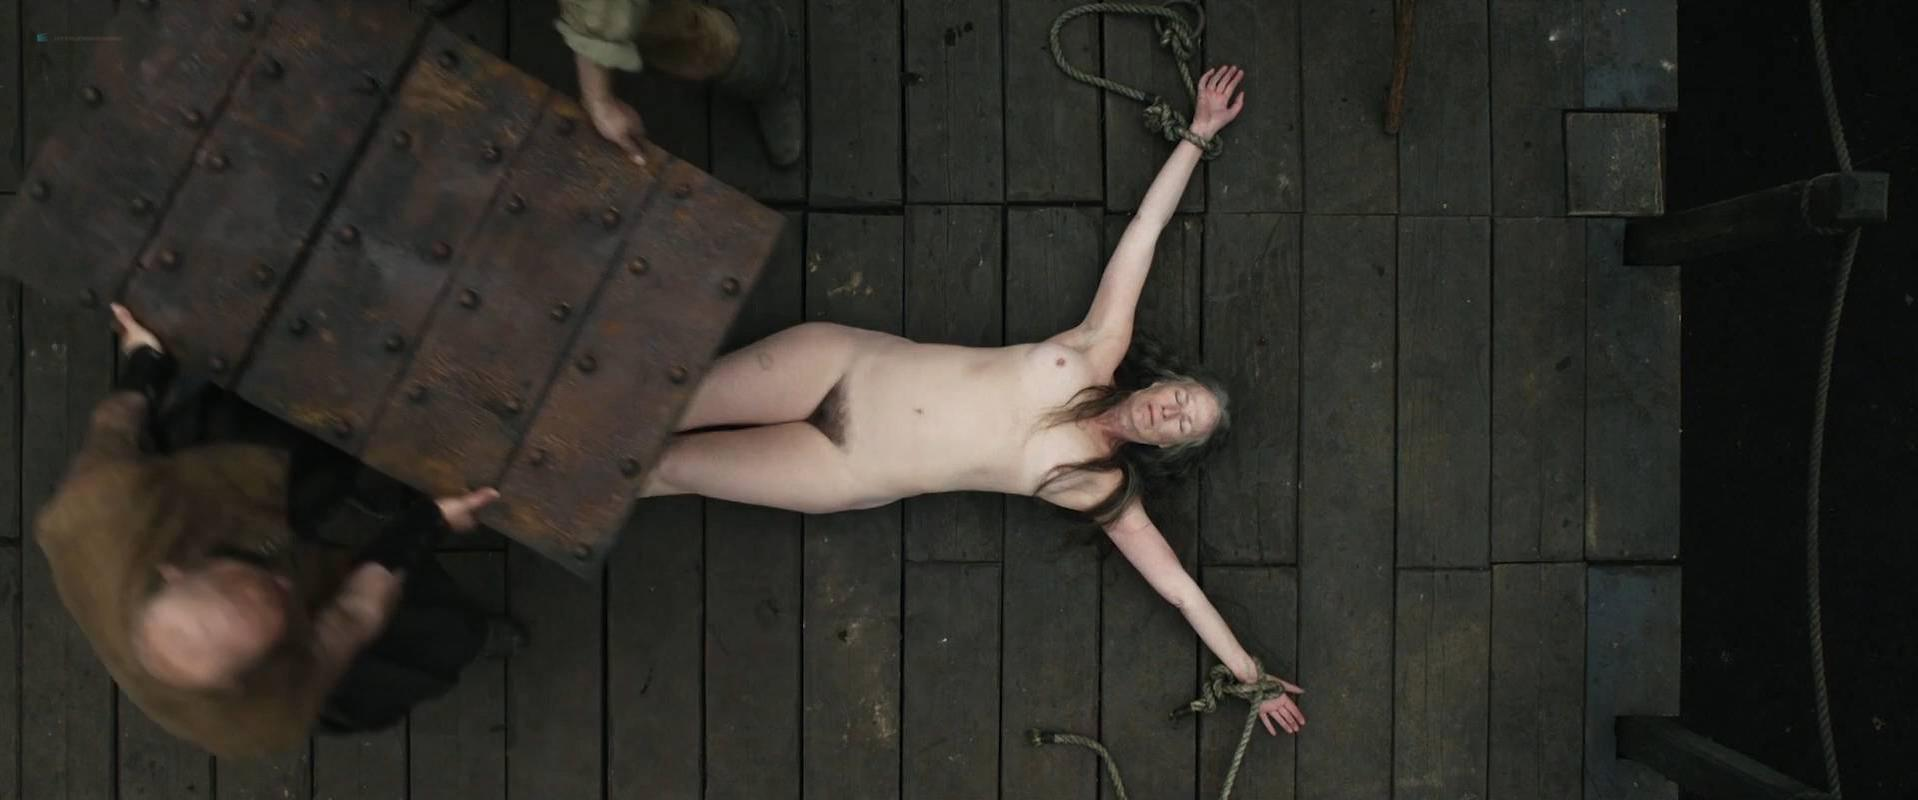 Sian Webber nude - Gunpowder s01e01 (2017)